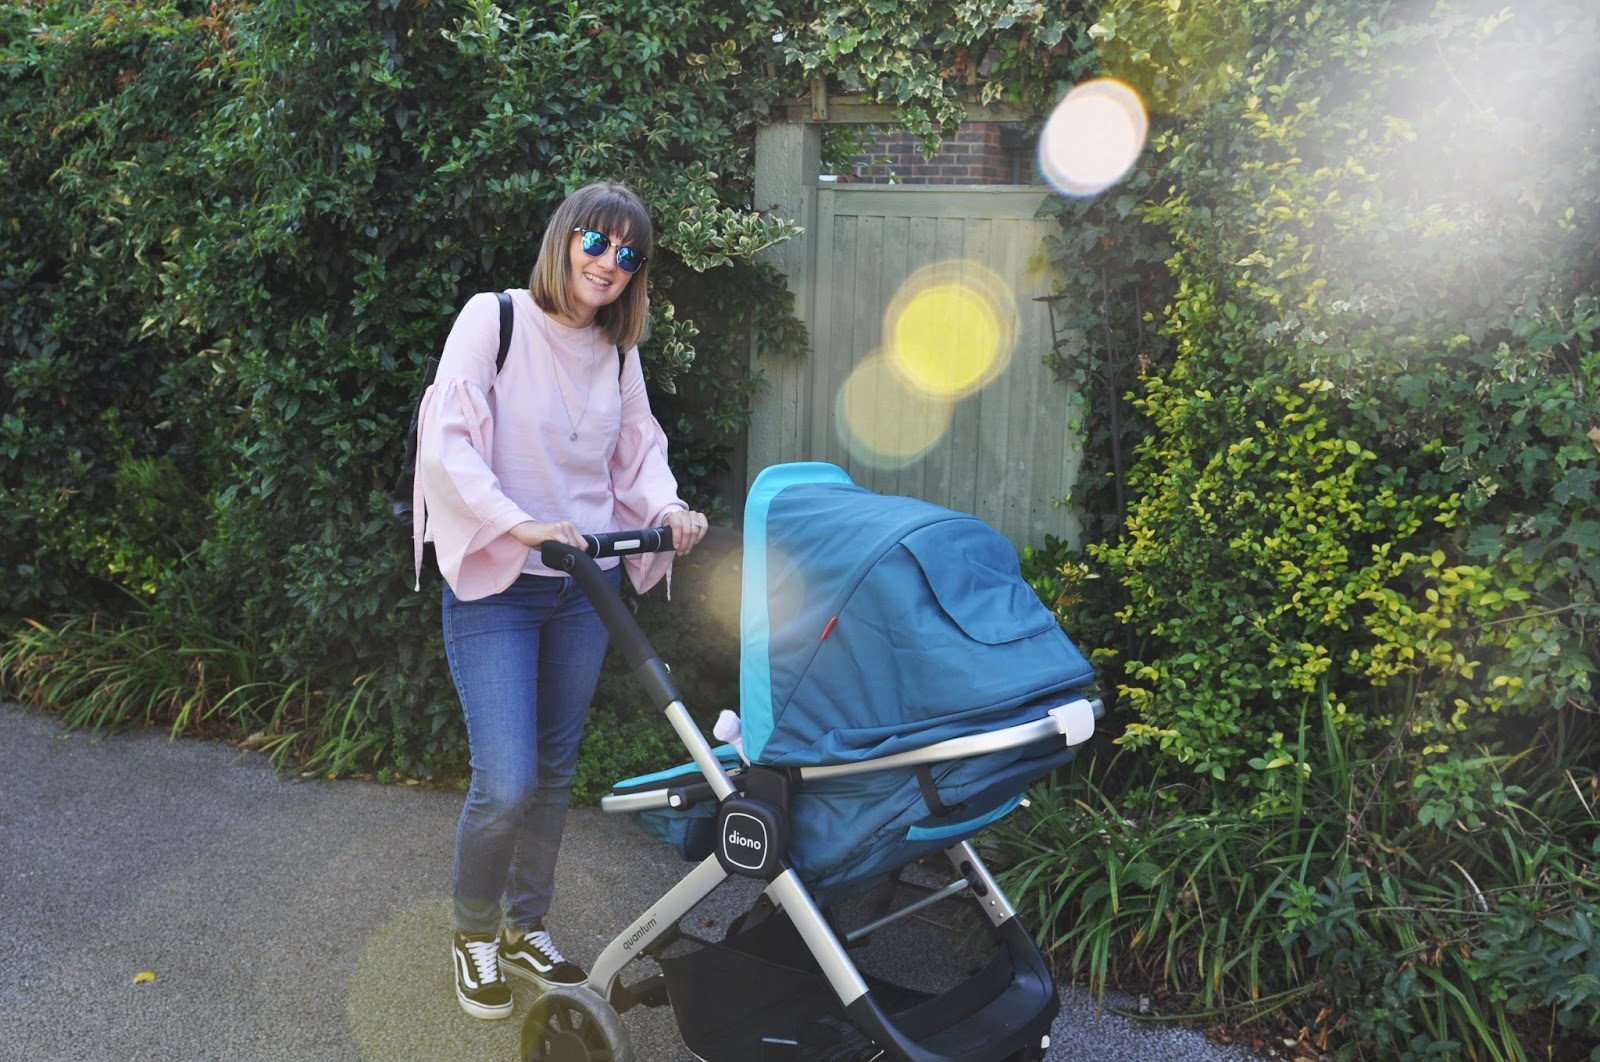 Review The Diono Quantum Multi Mode Travel Stroller Le Friend